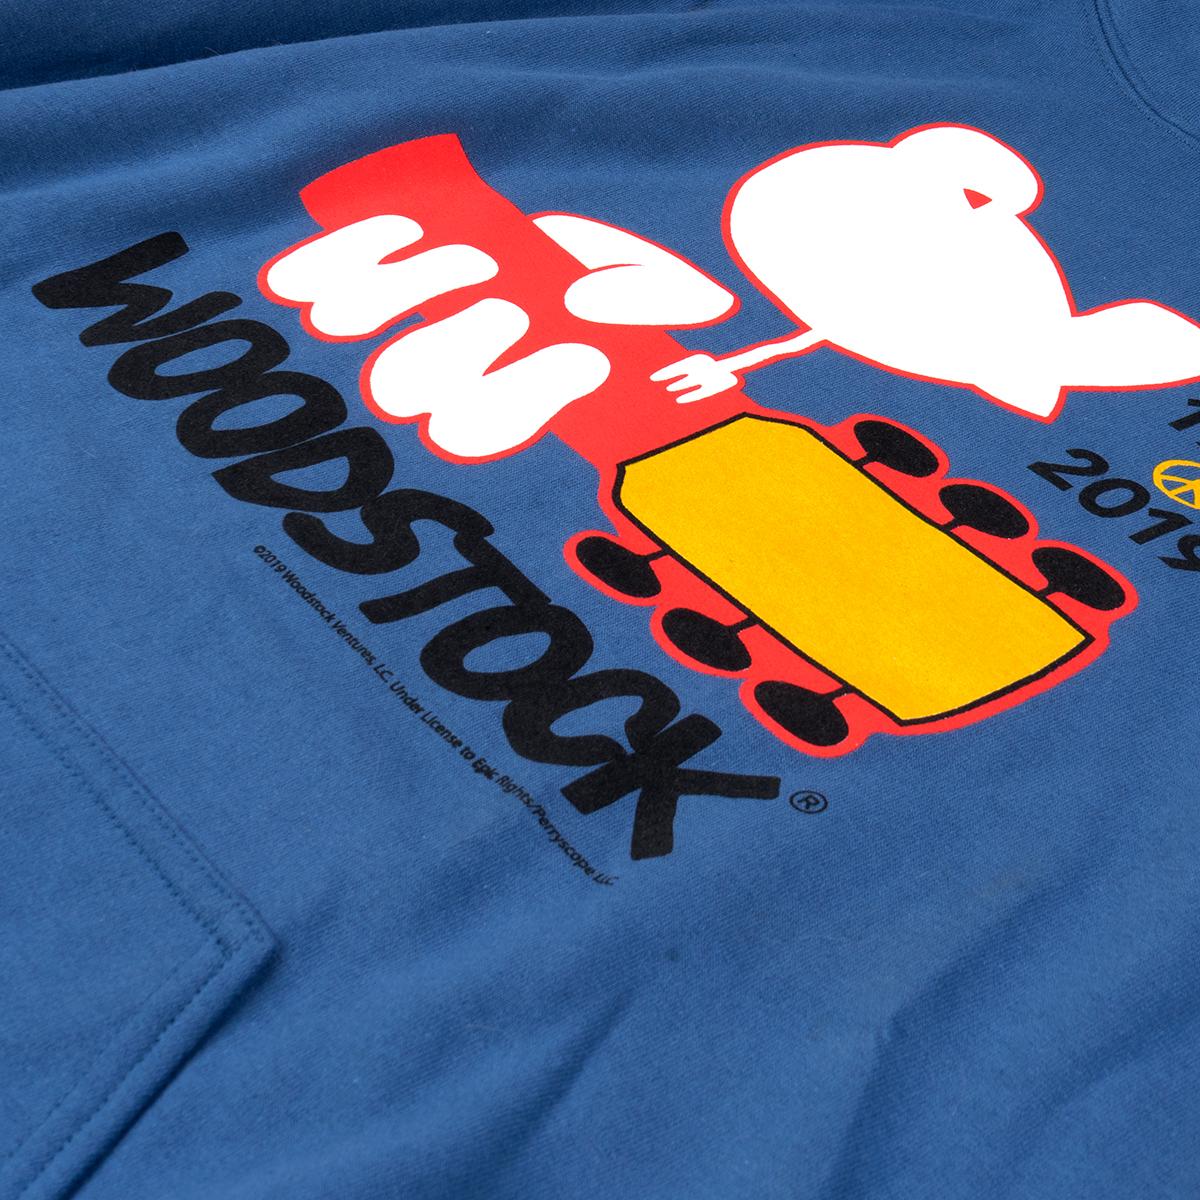 Woodstock 50th Anniversary Logo Hoodie